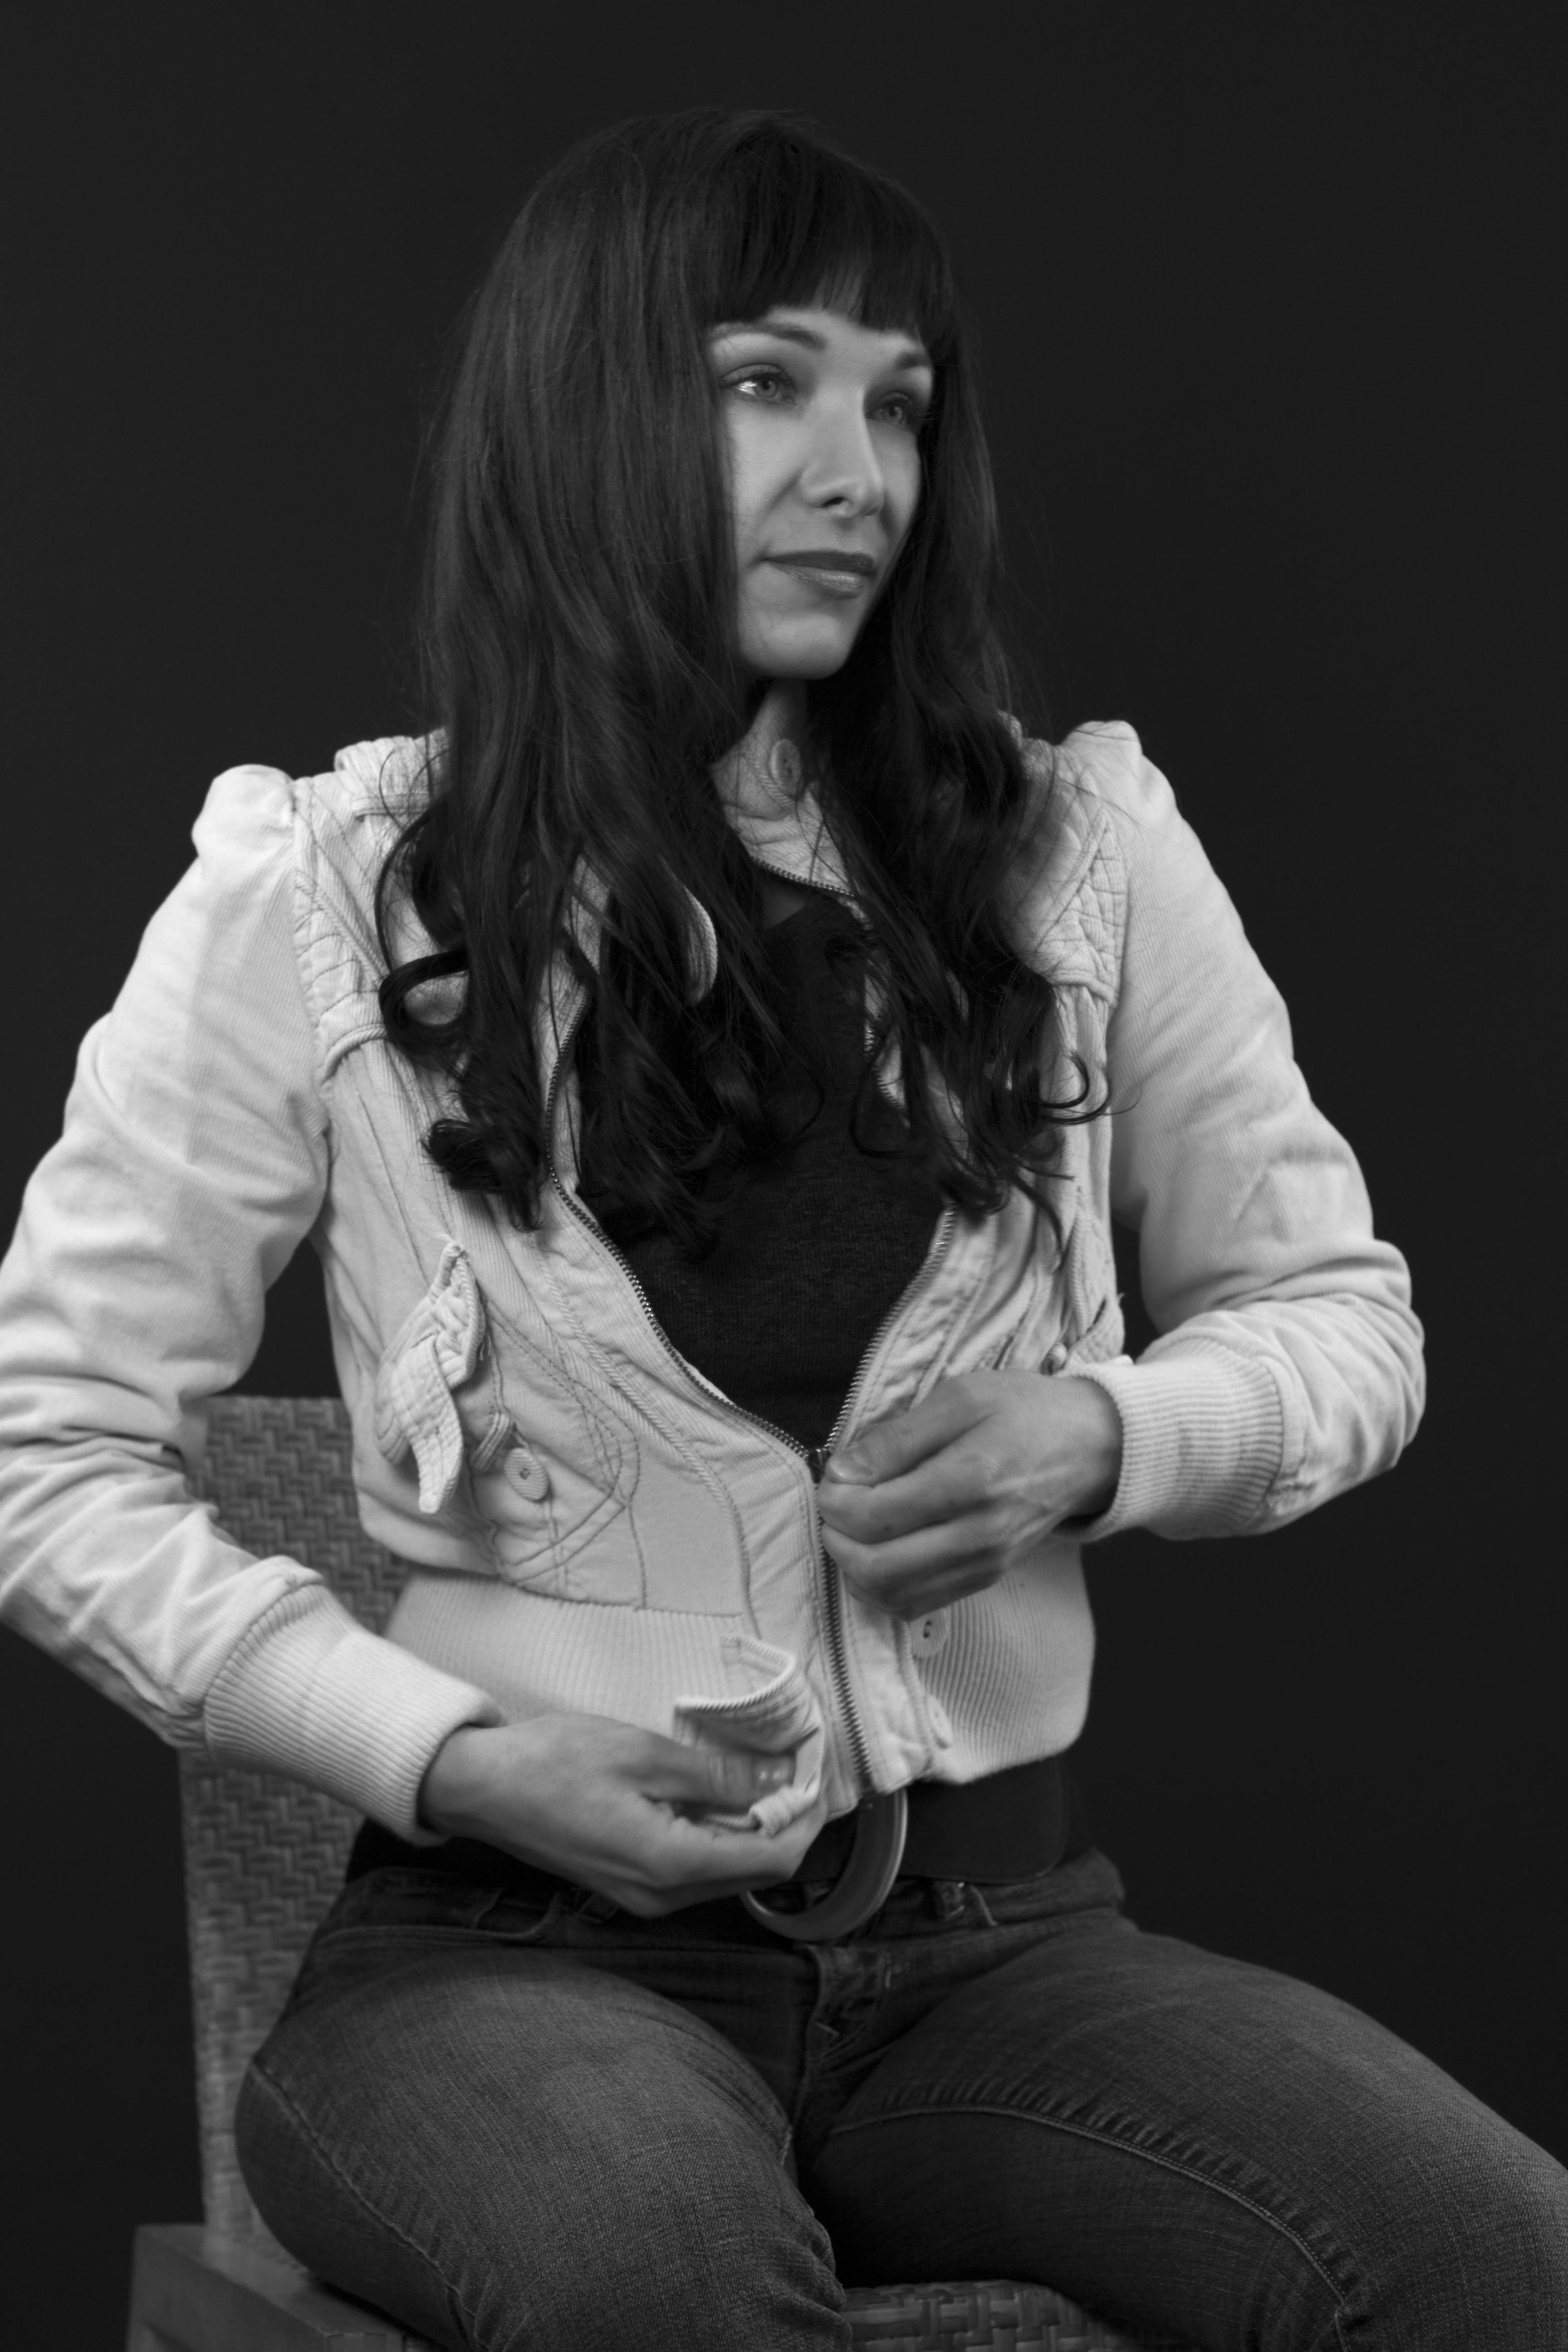 Sonia Edgy | singer